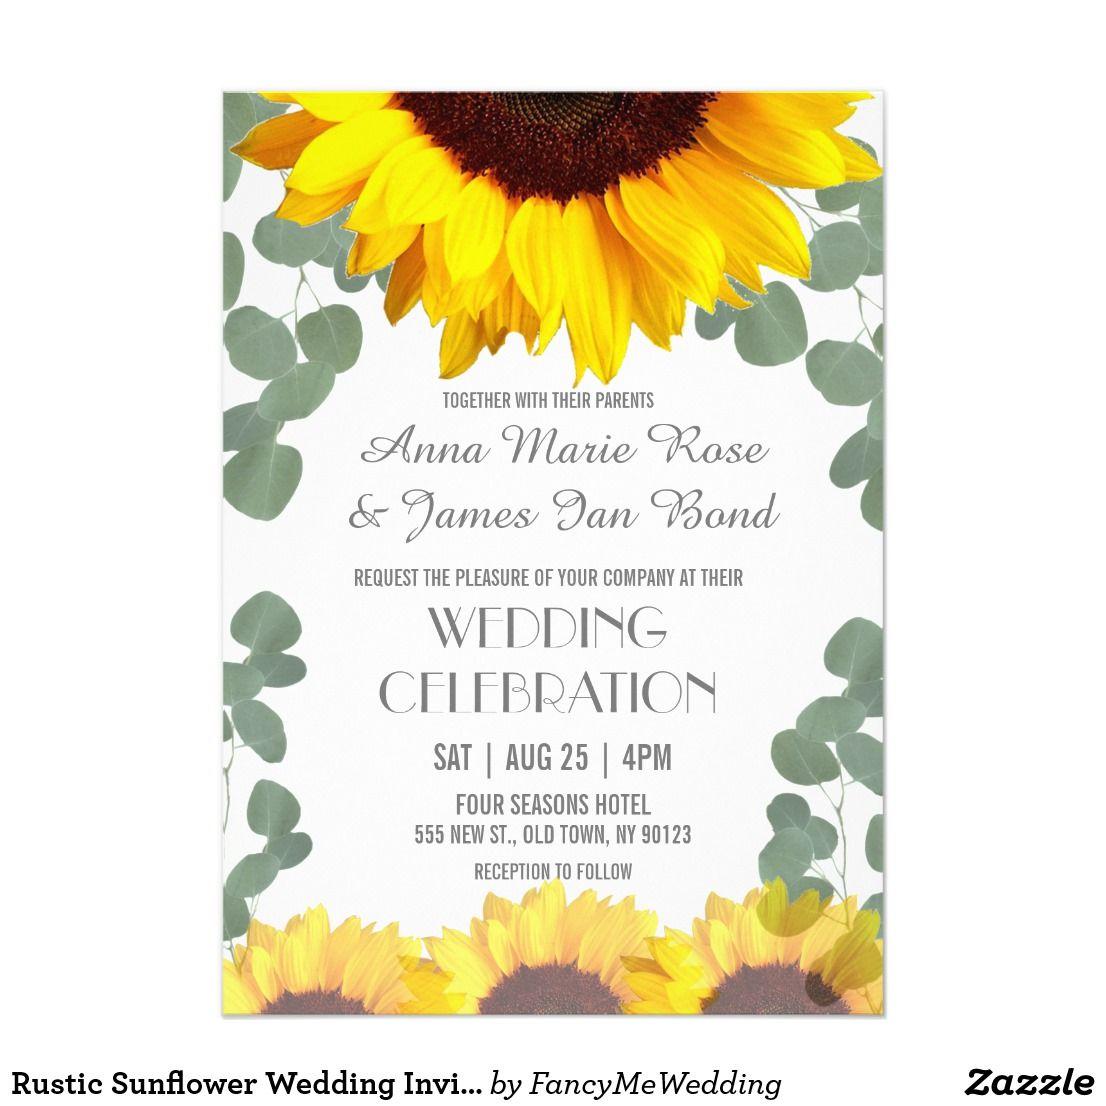 Rustic Sunflower Wedding Invitations Rustic